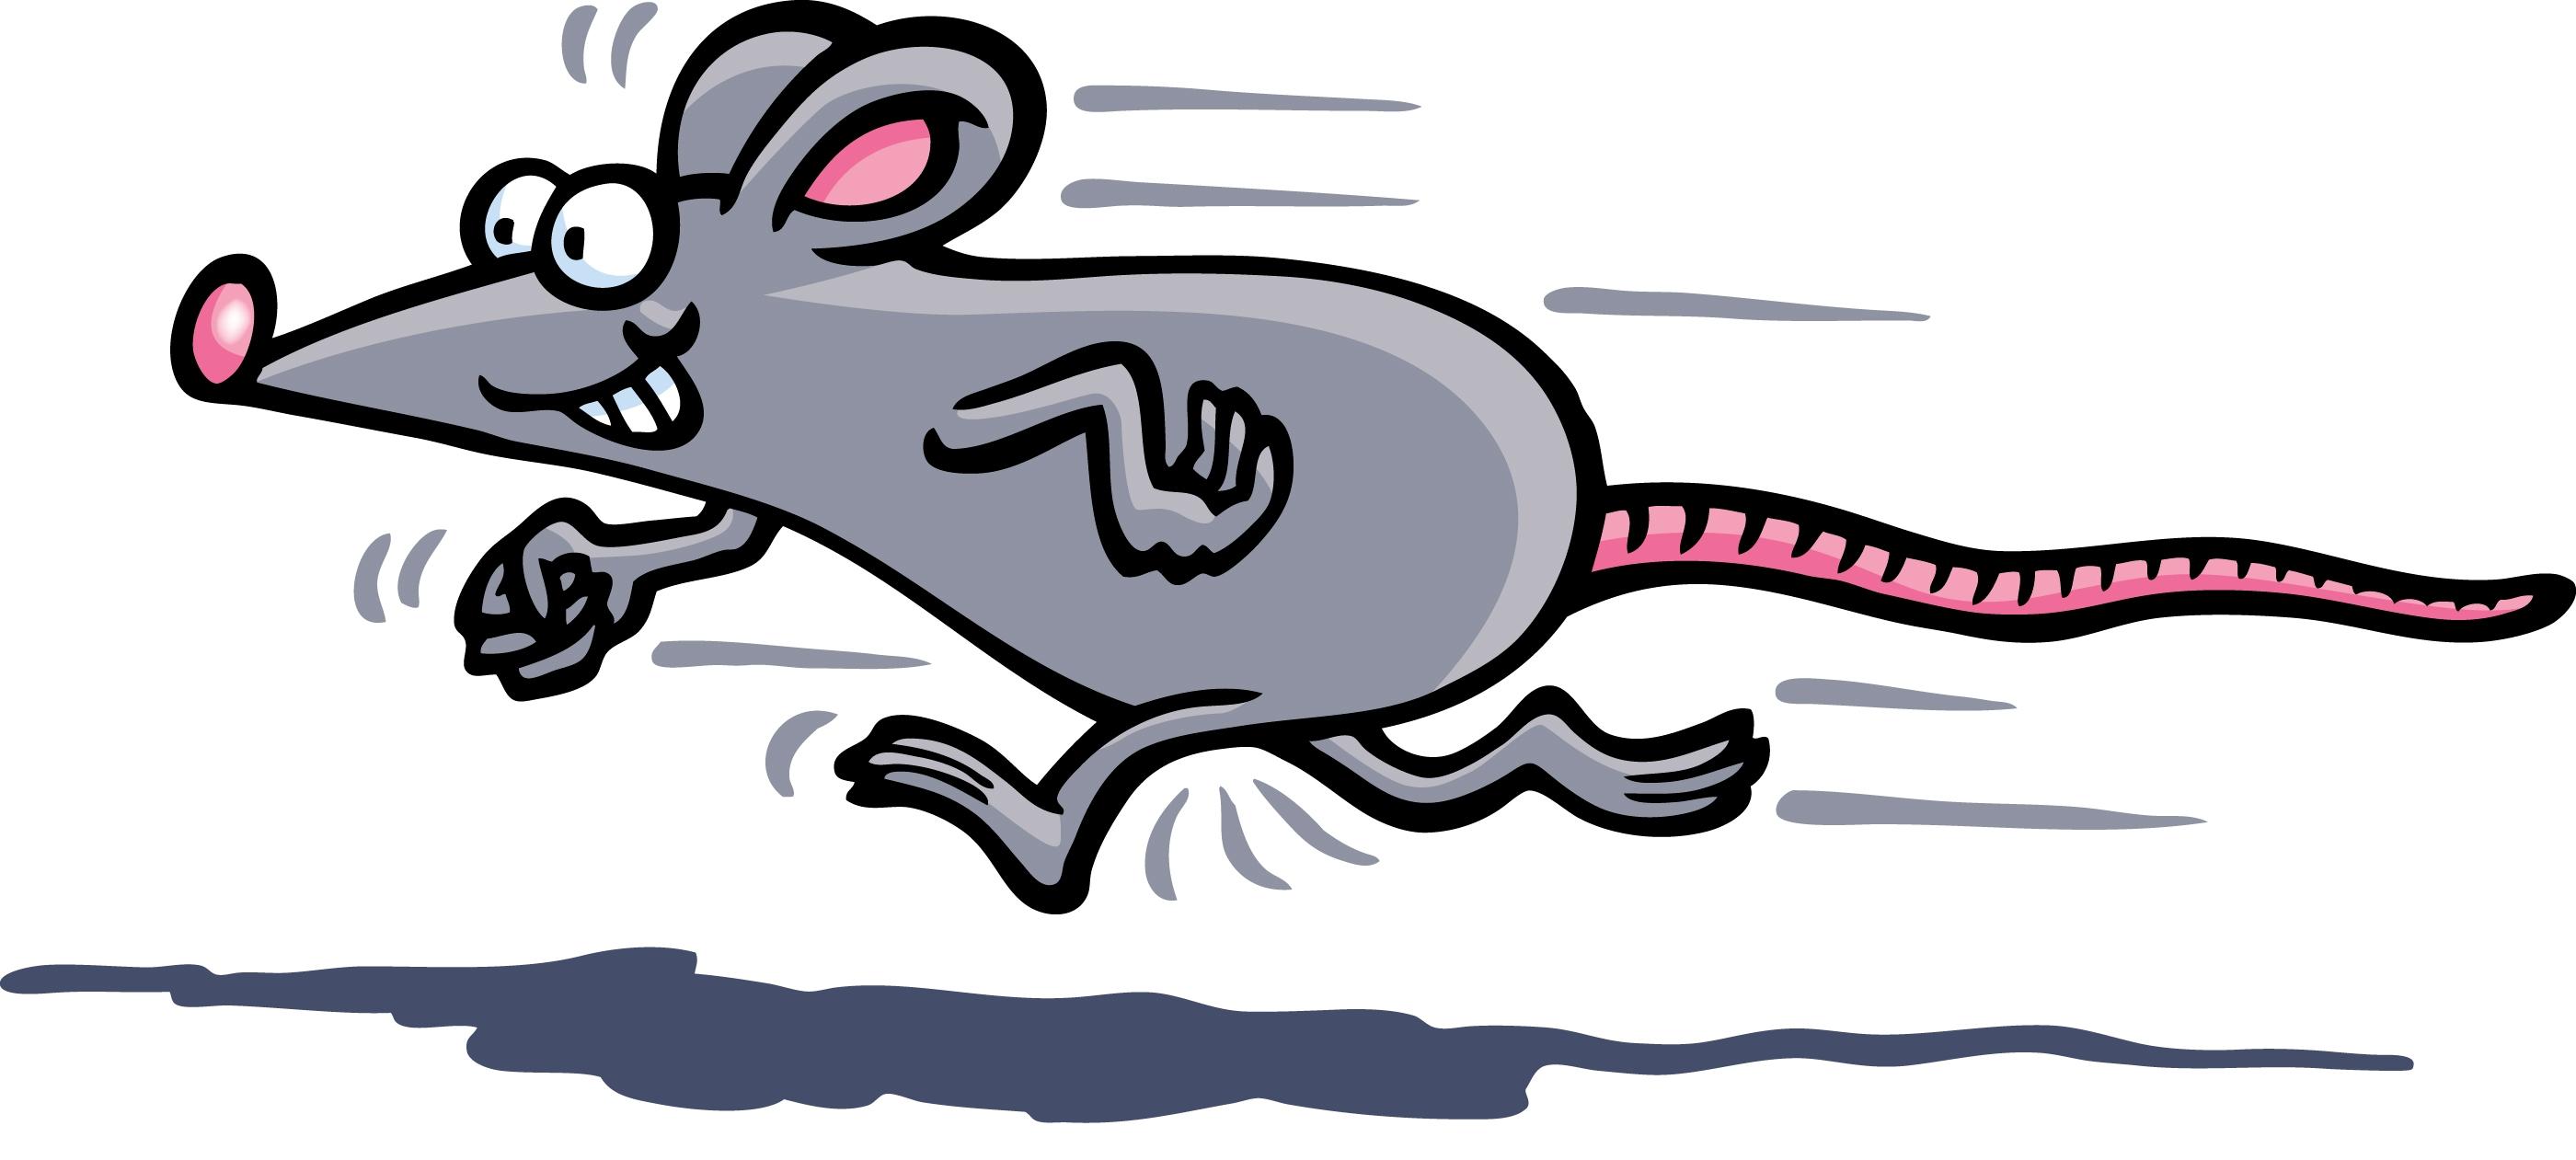 Mouse Race Clipart - Clipart Kid